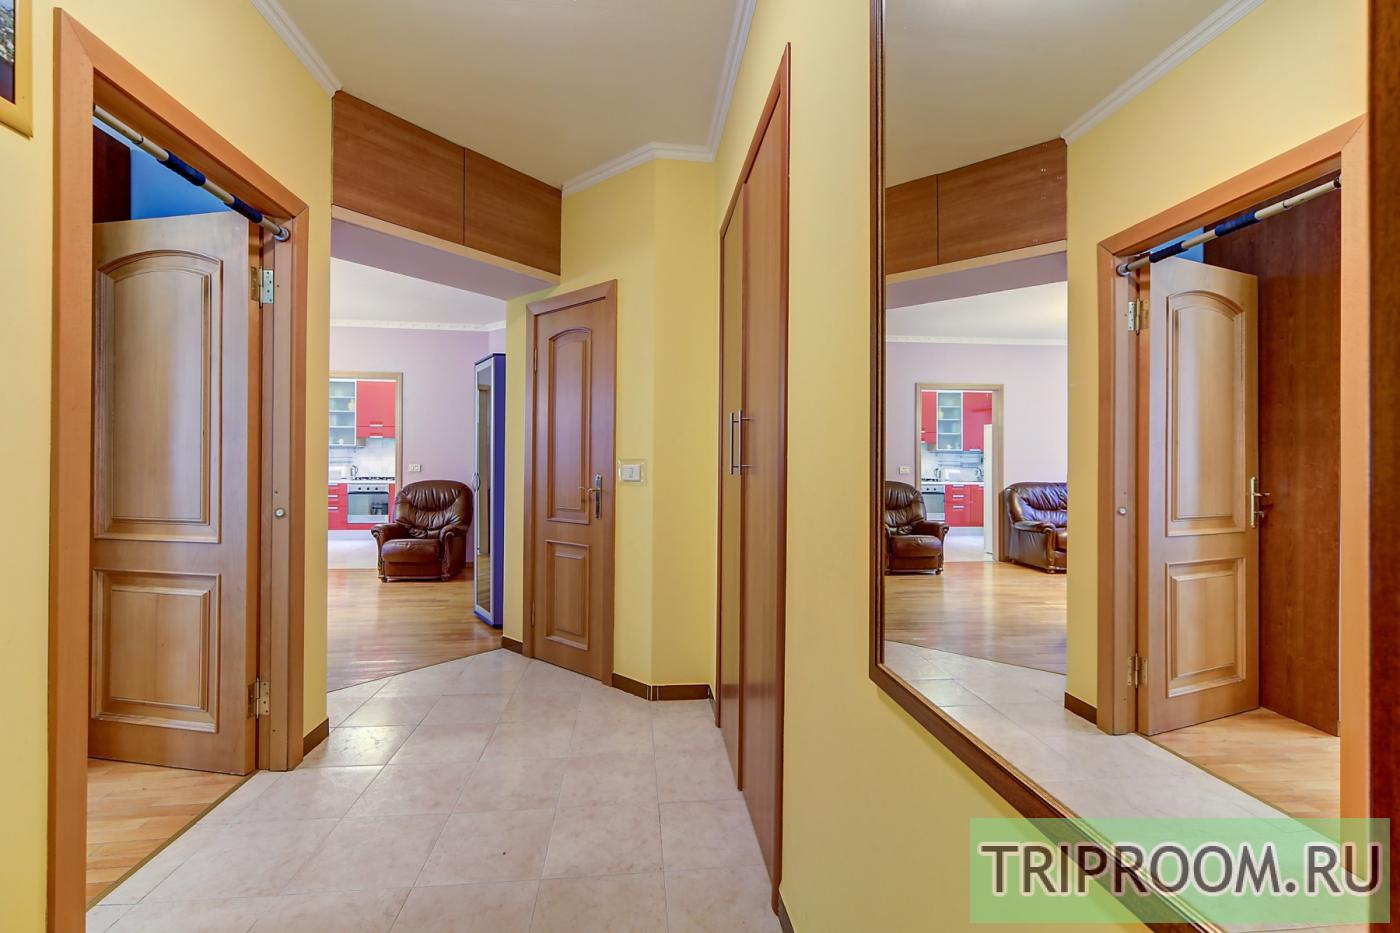 2-комнатная квартира посуточно (вариант № 20143), ул. Невский проспект, фото № 7